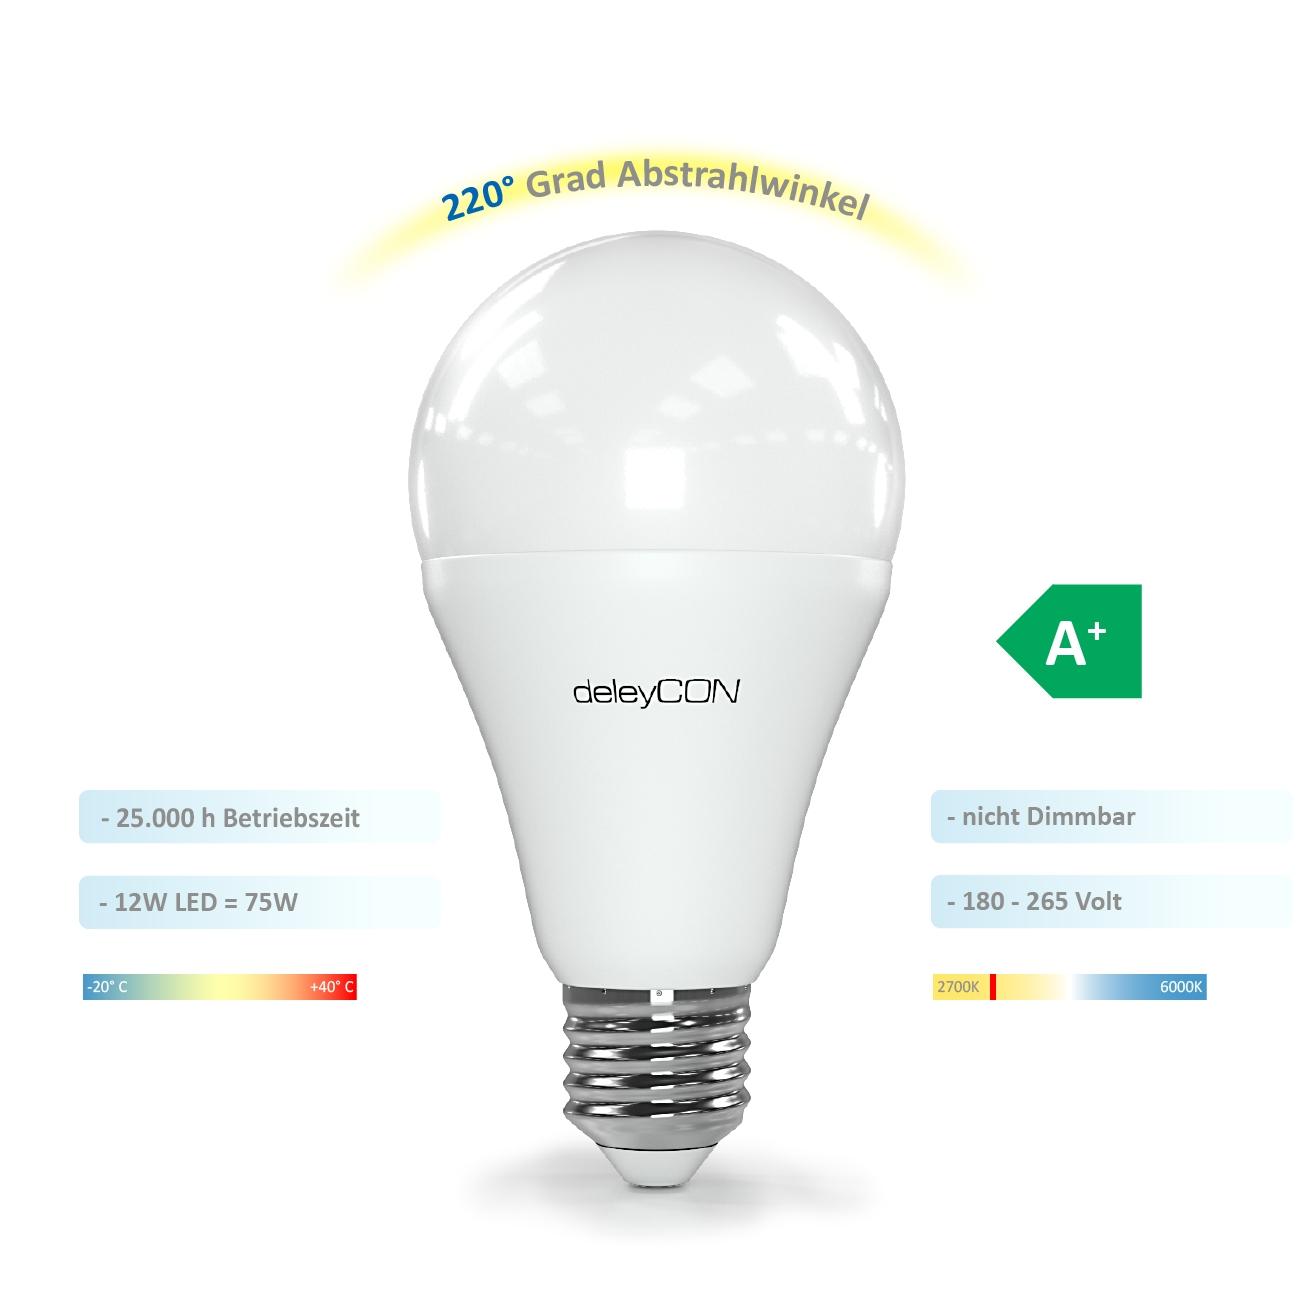 deleycon led energiesparlampe fassung e27 a60 2700k warm wei 12w deleycon deleycon. Black Bedroom Furniture Sets. Home Design Ideas